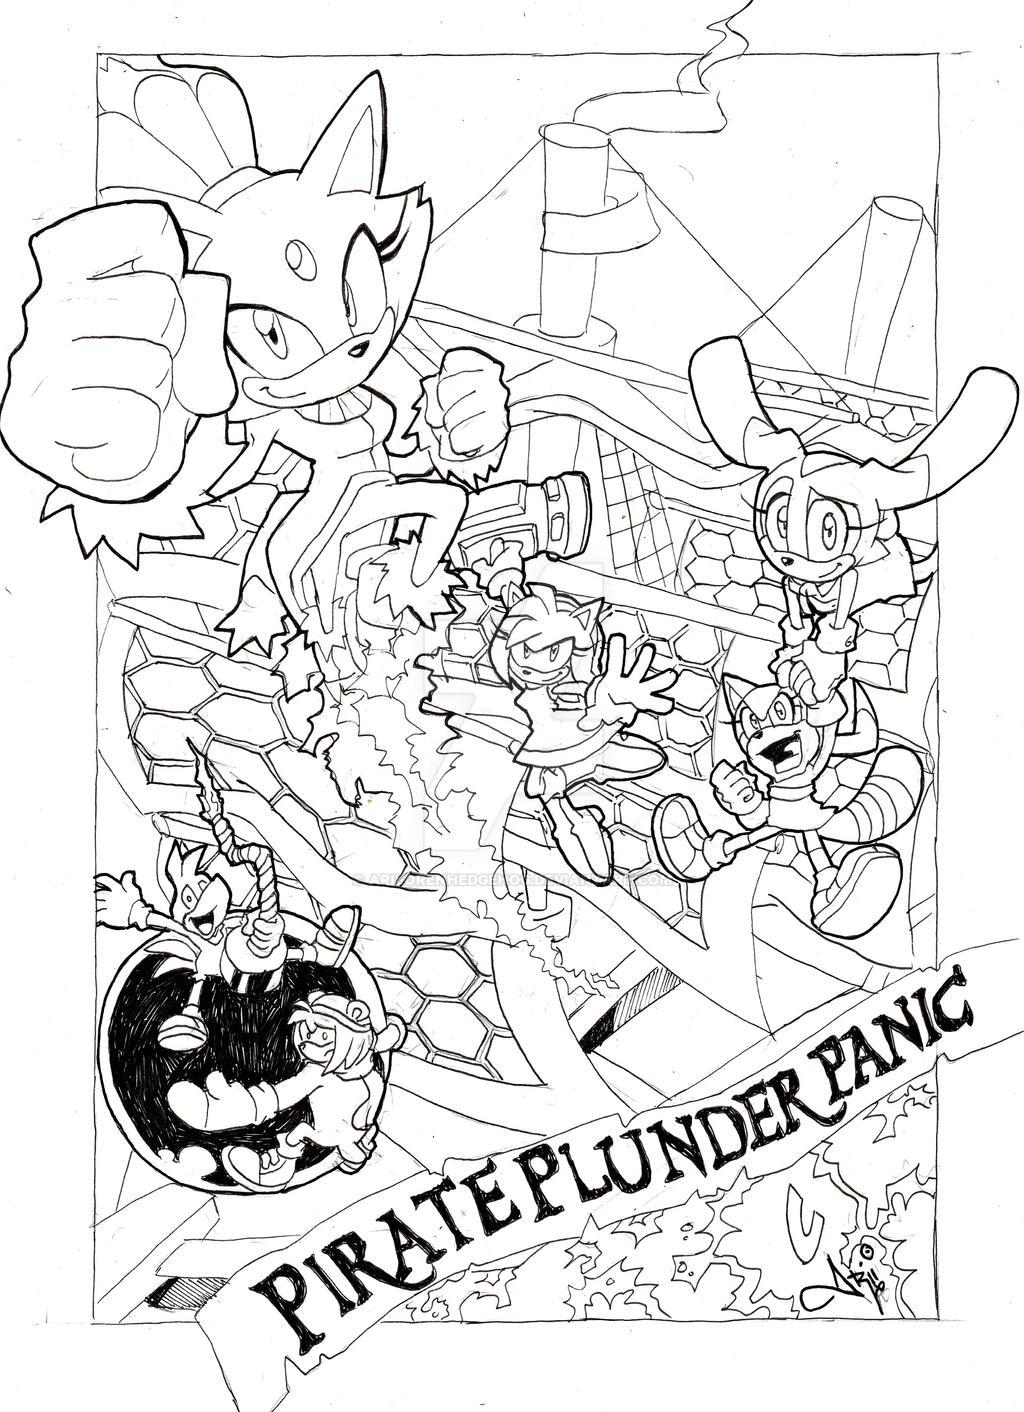 Pirate Plunder Panic (Lineart sketch version) by AriLorenHedgehog